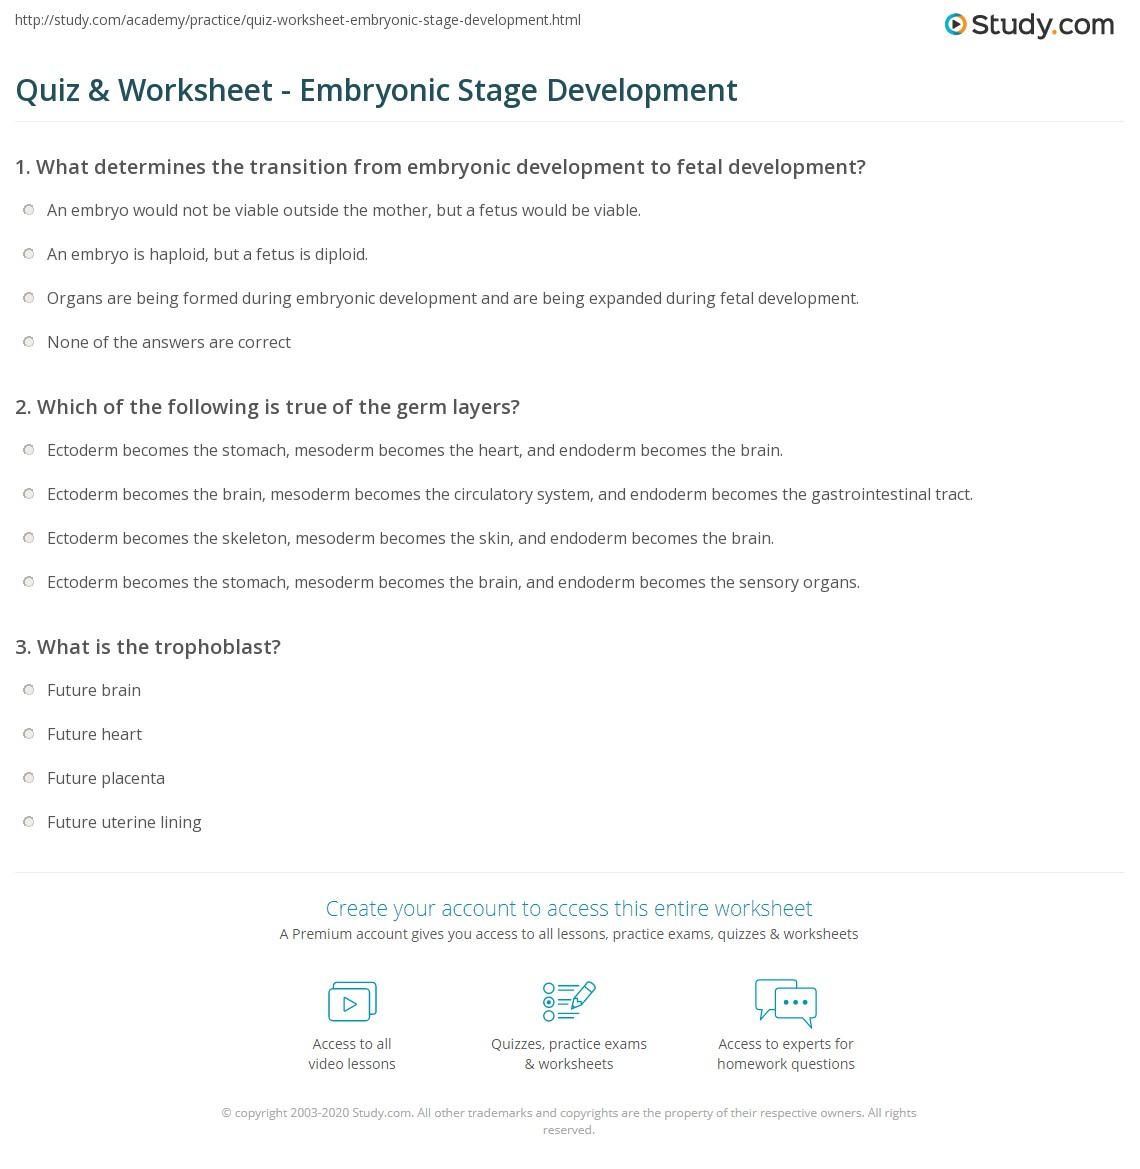 Quiz & Worksheet - Embryonic Stage Development | Study.com